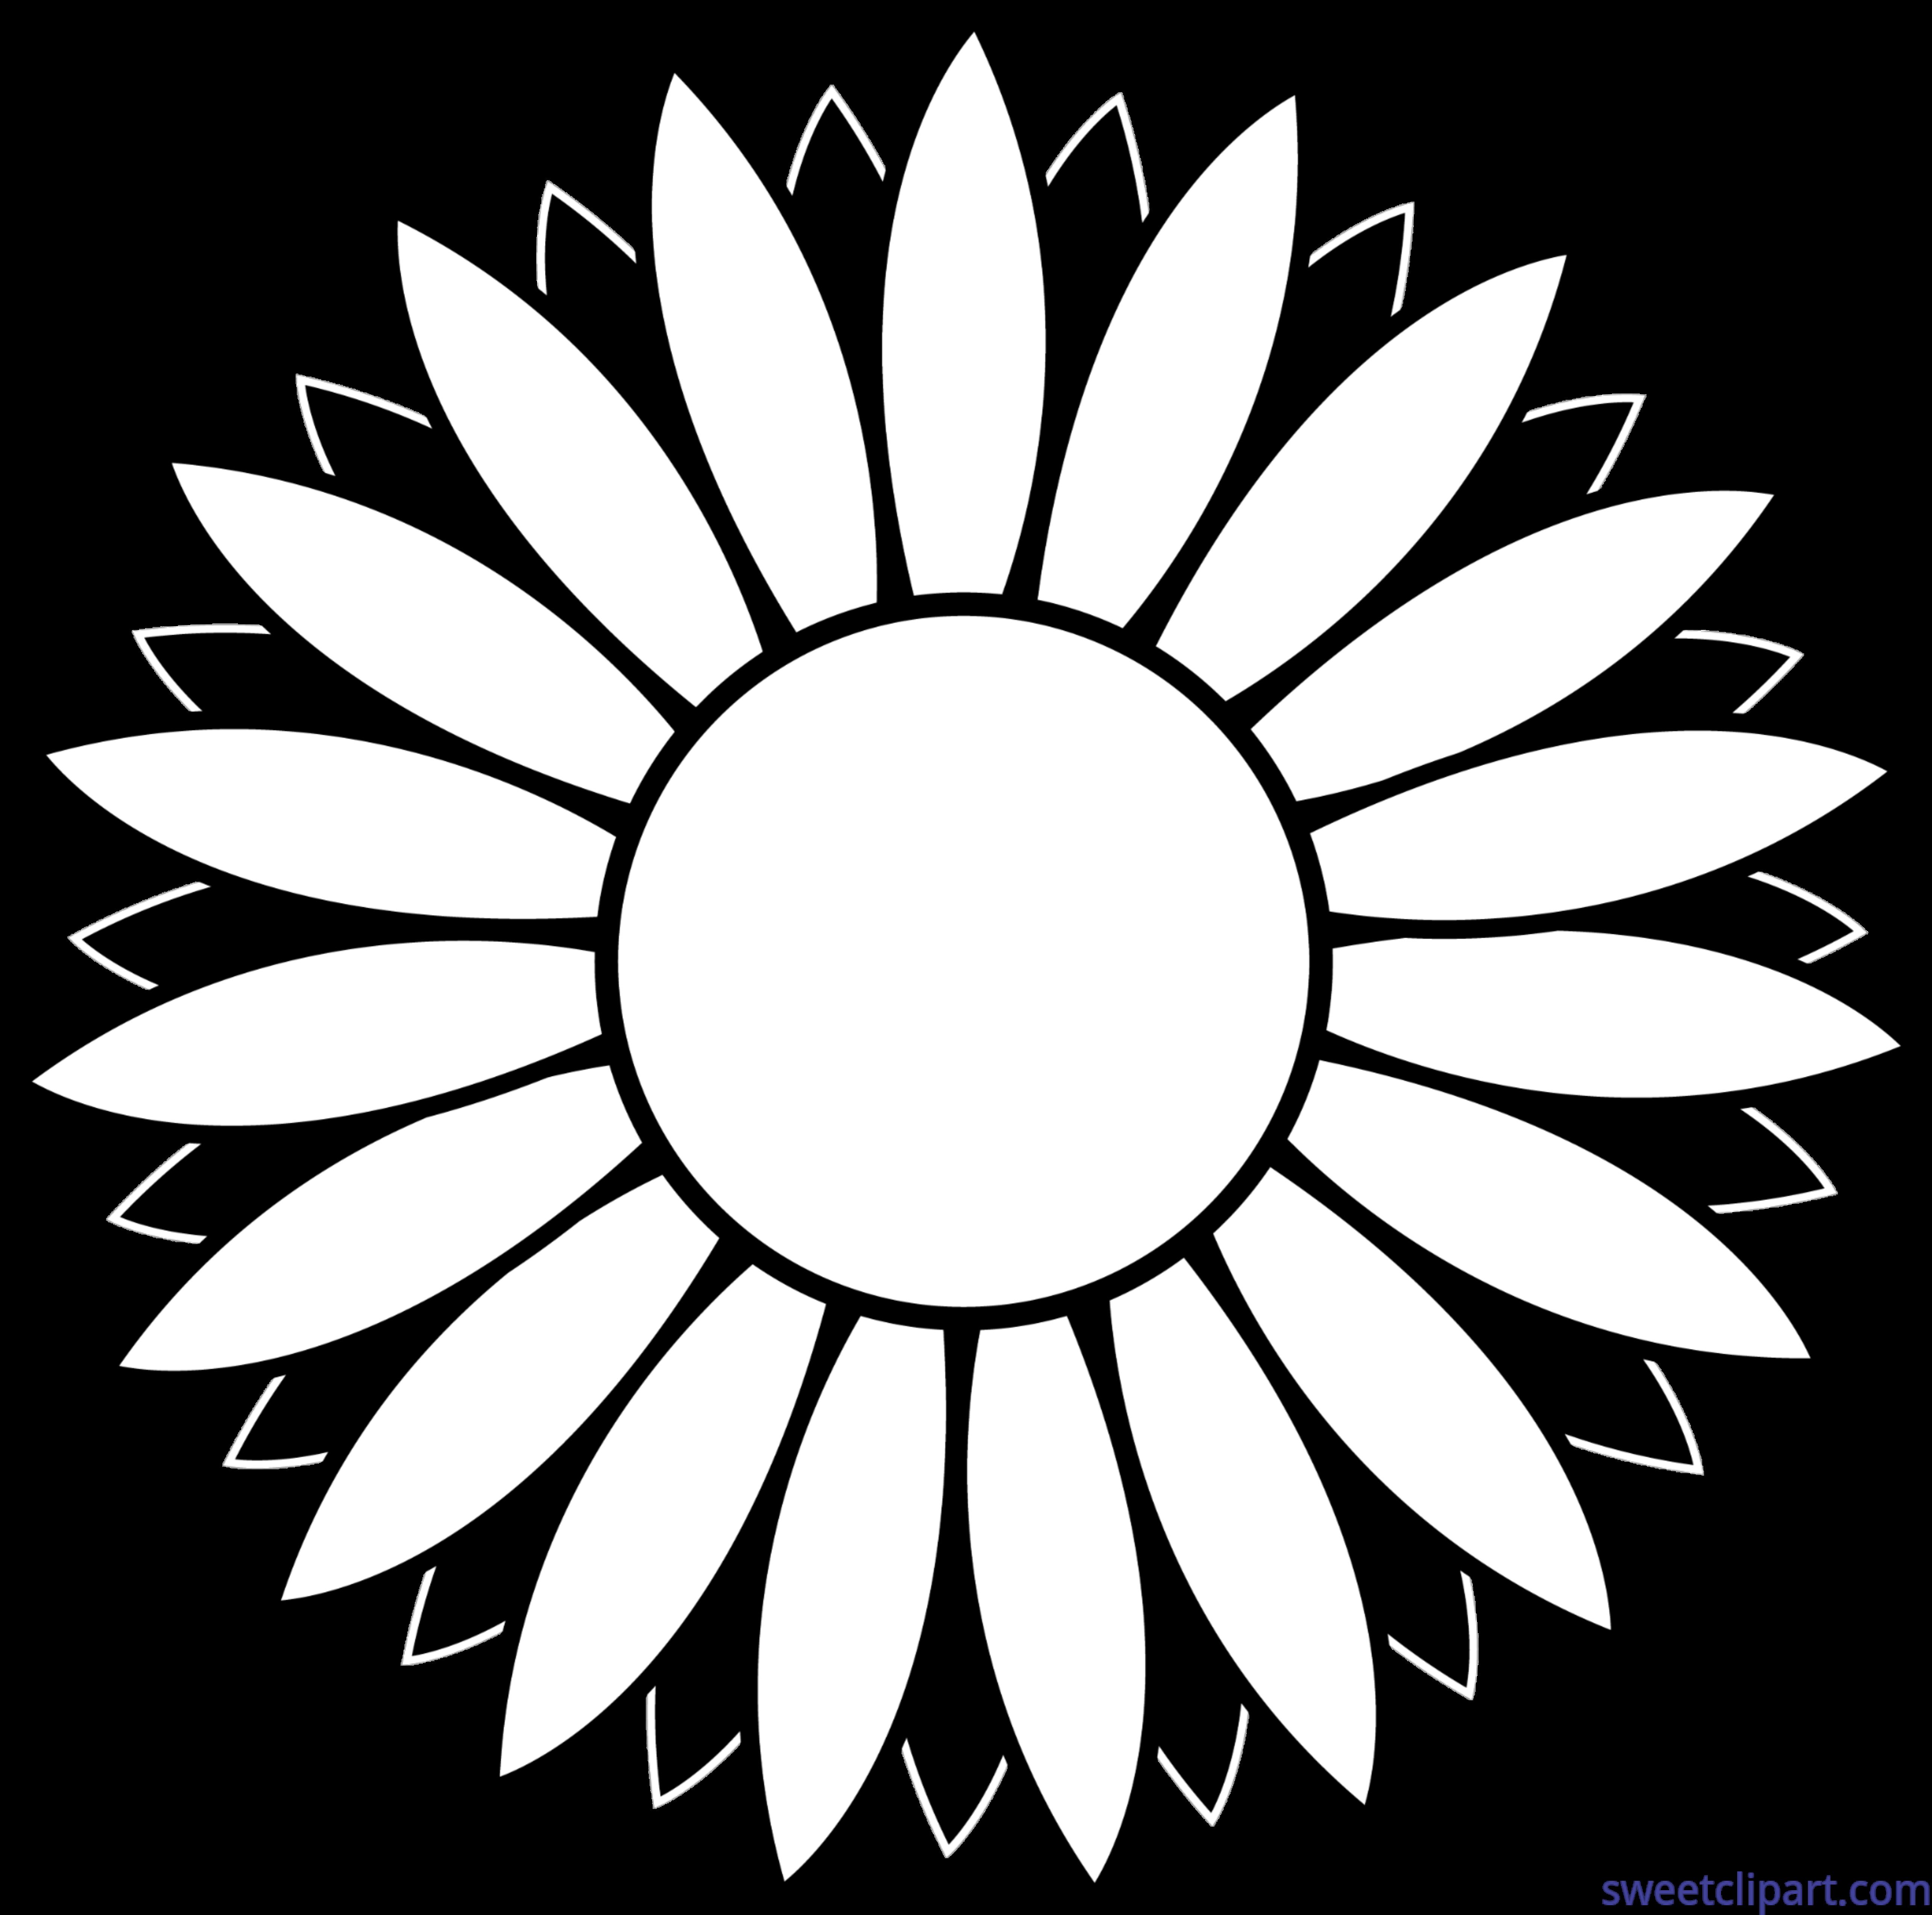 Flower sunflower black and. Shell clipart lineart